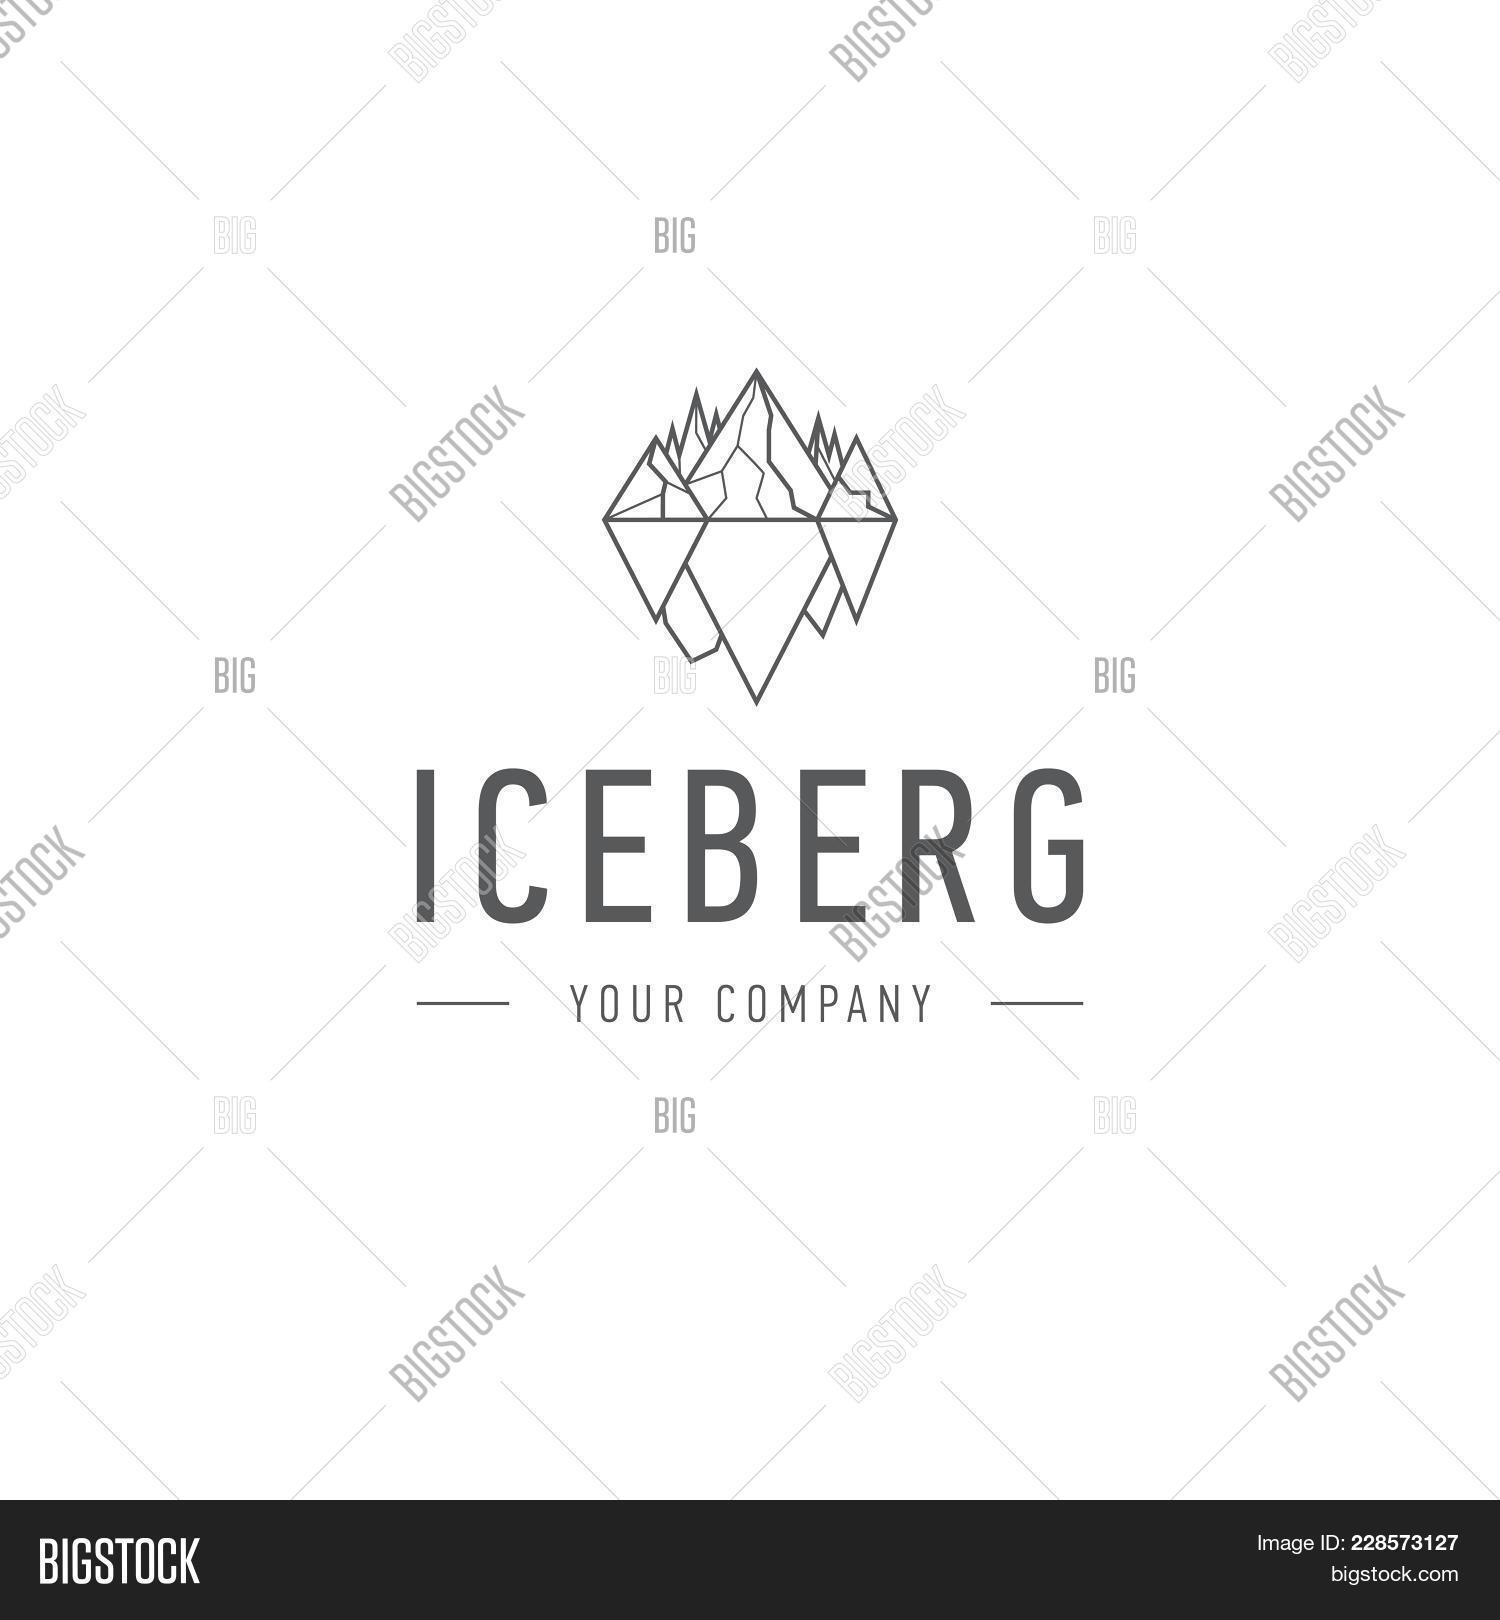 iceberg triangle cold image photo free trial bigstock